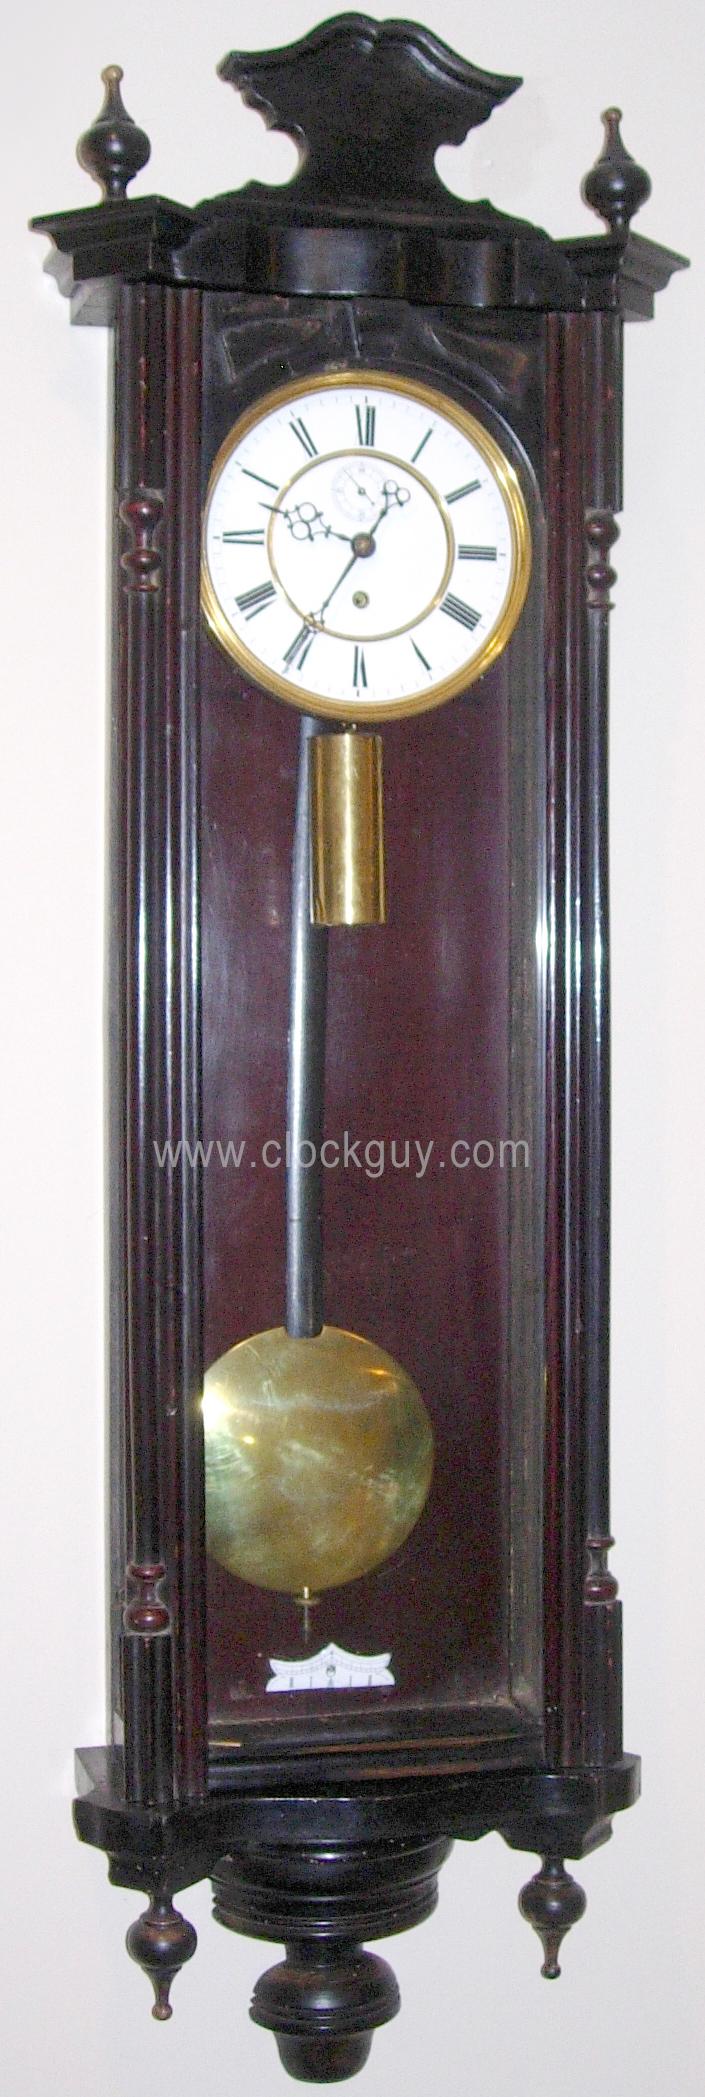 Antique Clocks Guy We Bring Antique Clocks Collectors And